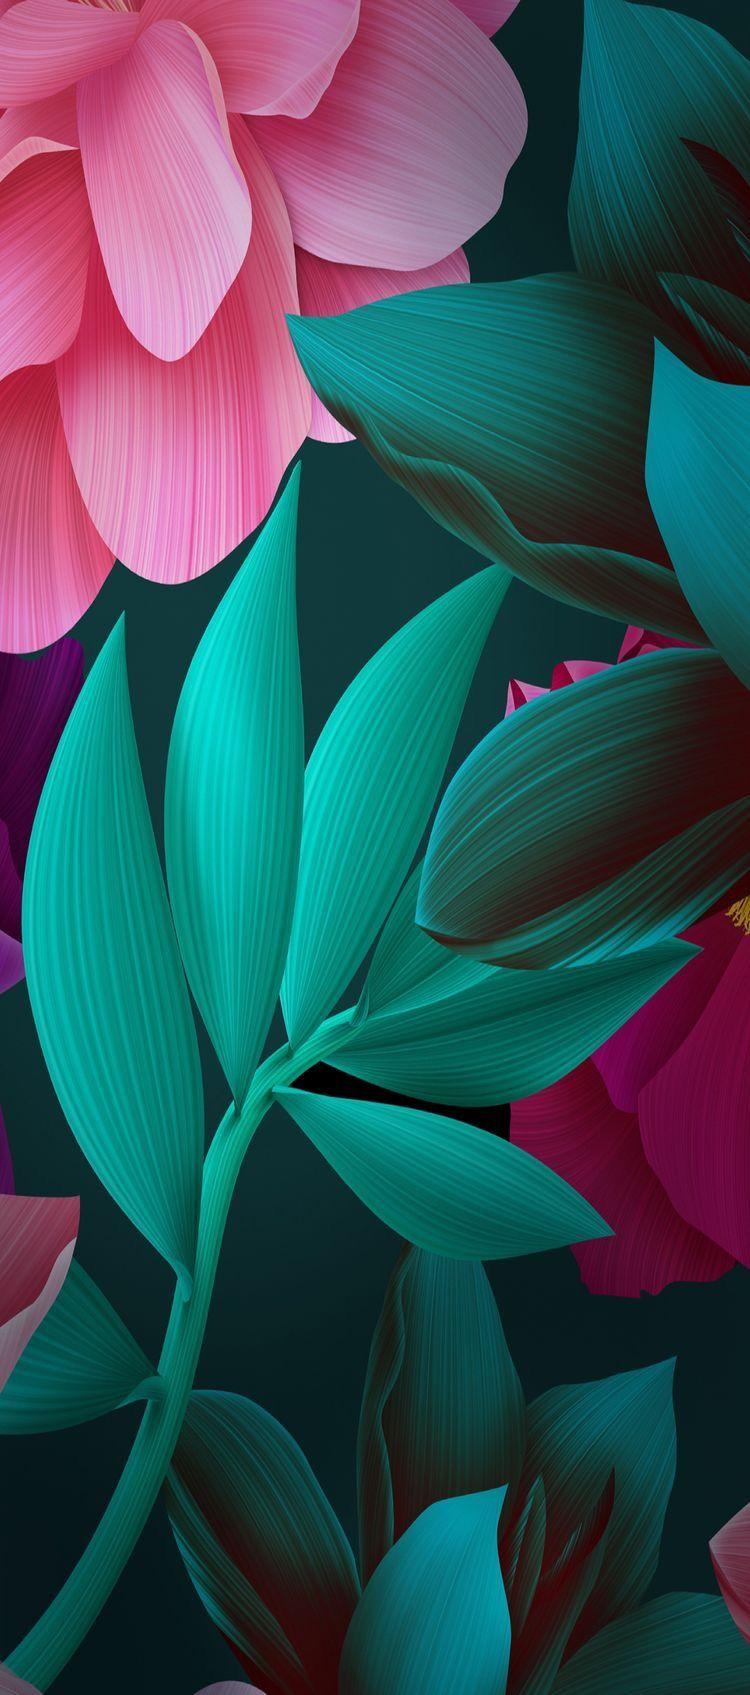 Iphone 11 Wallpaper 4k Floral